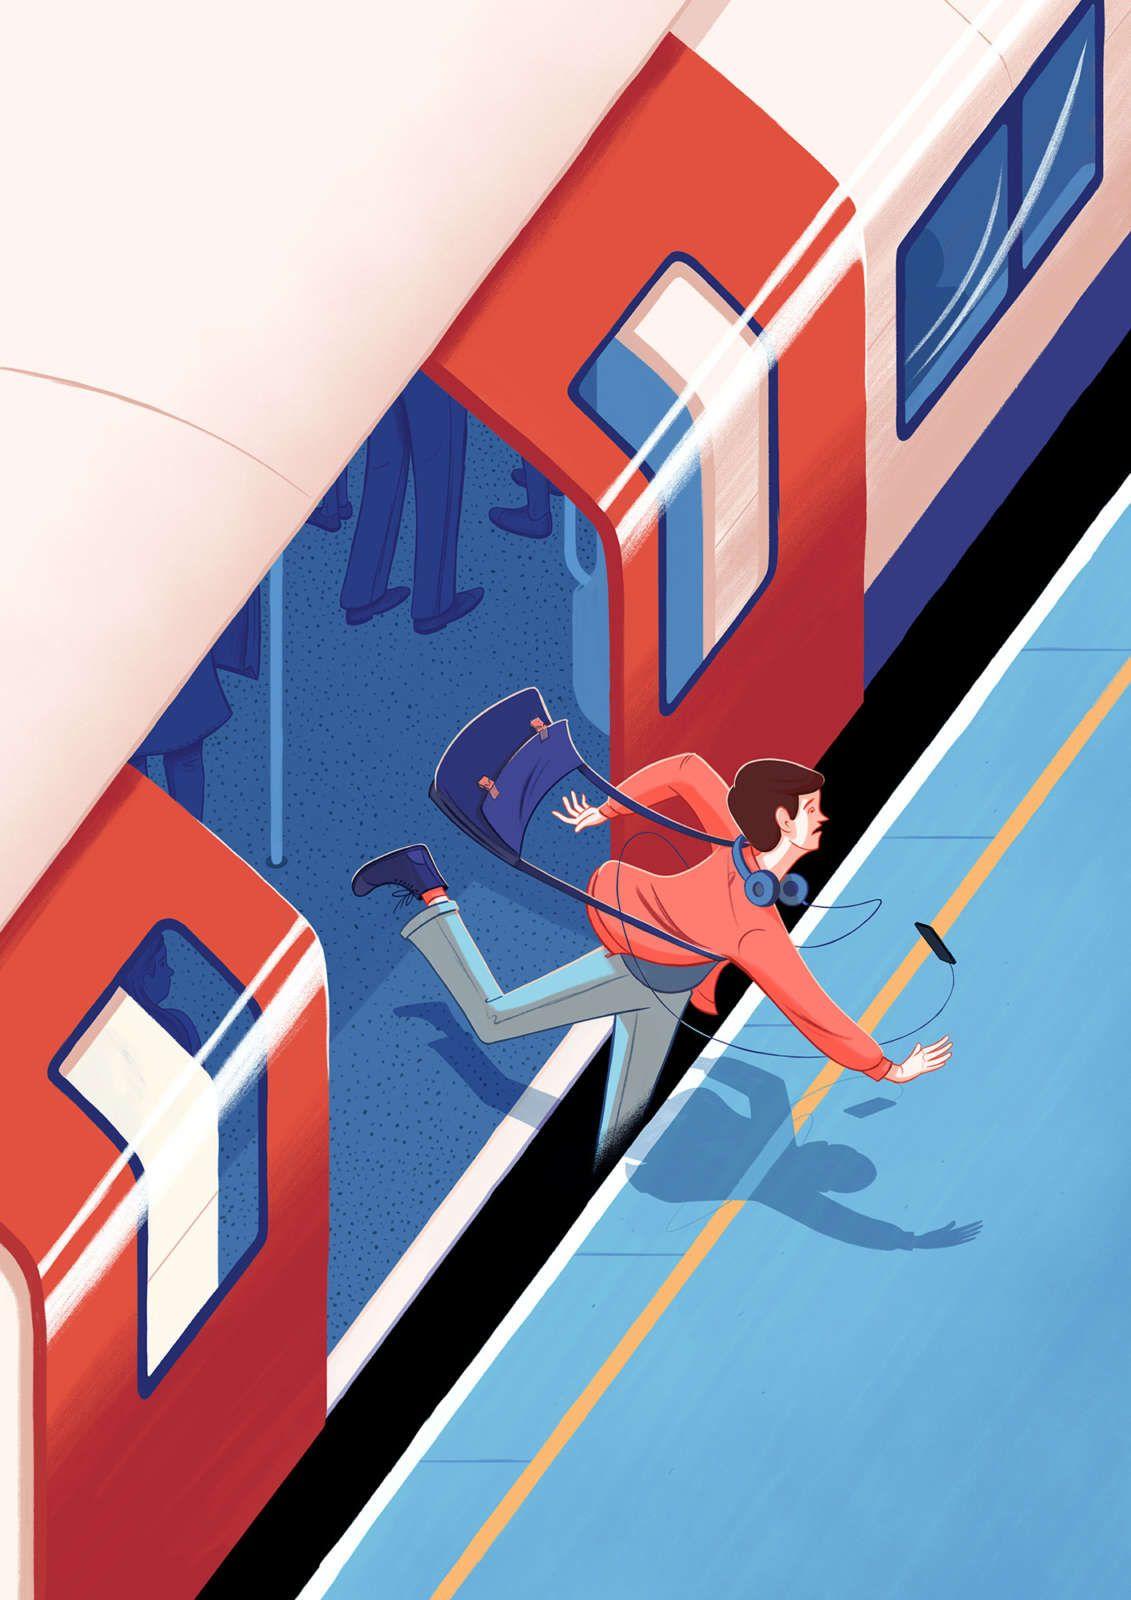 Studio Train illustration, Graphic illustration